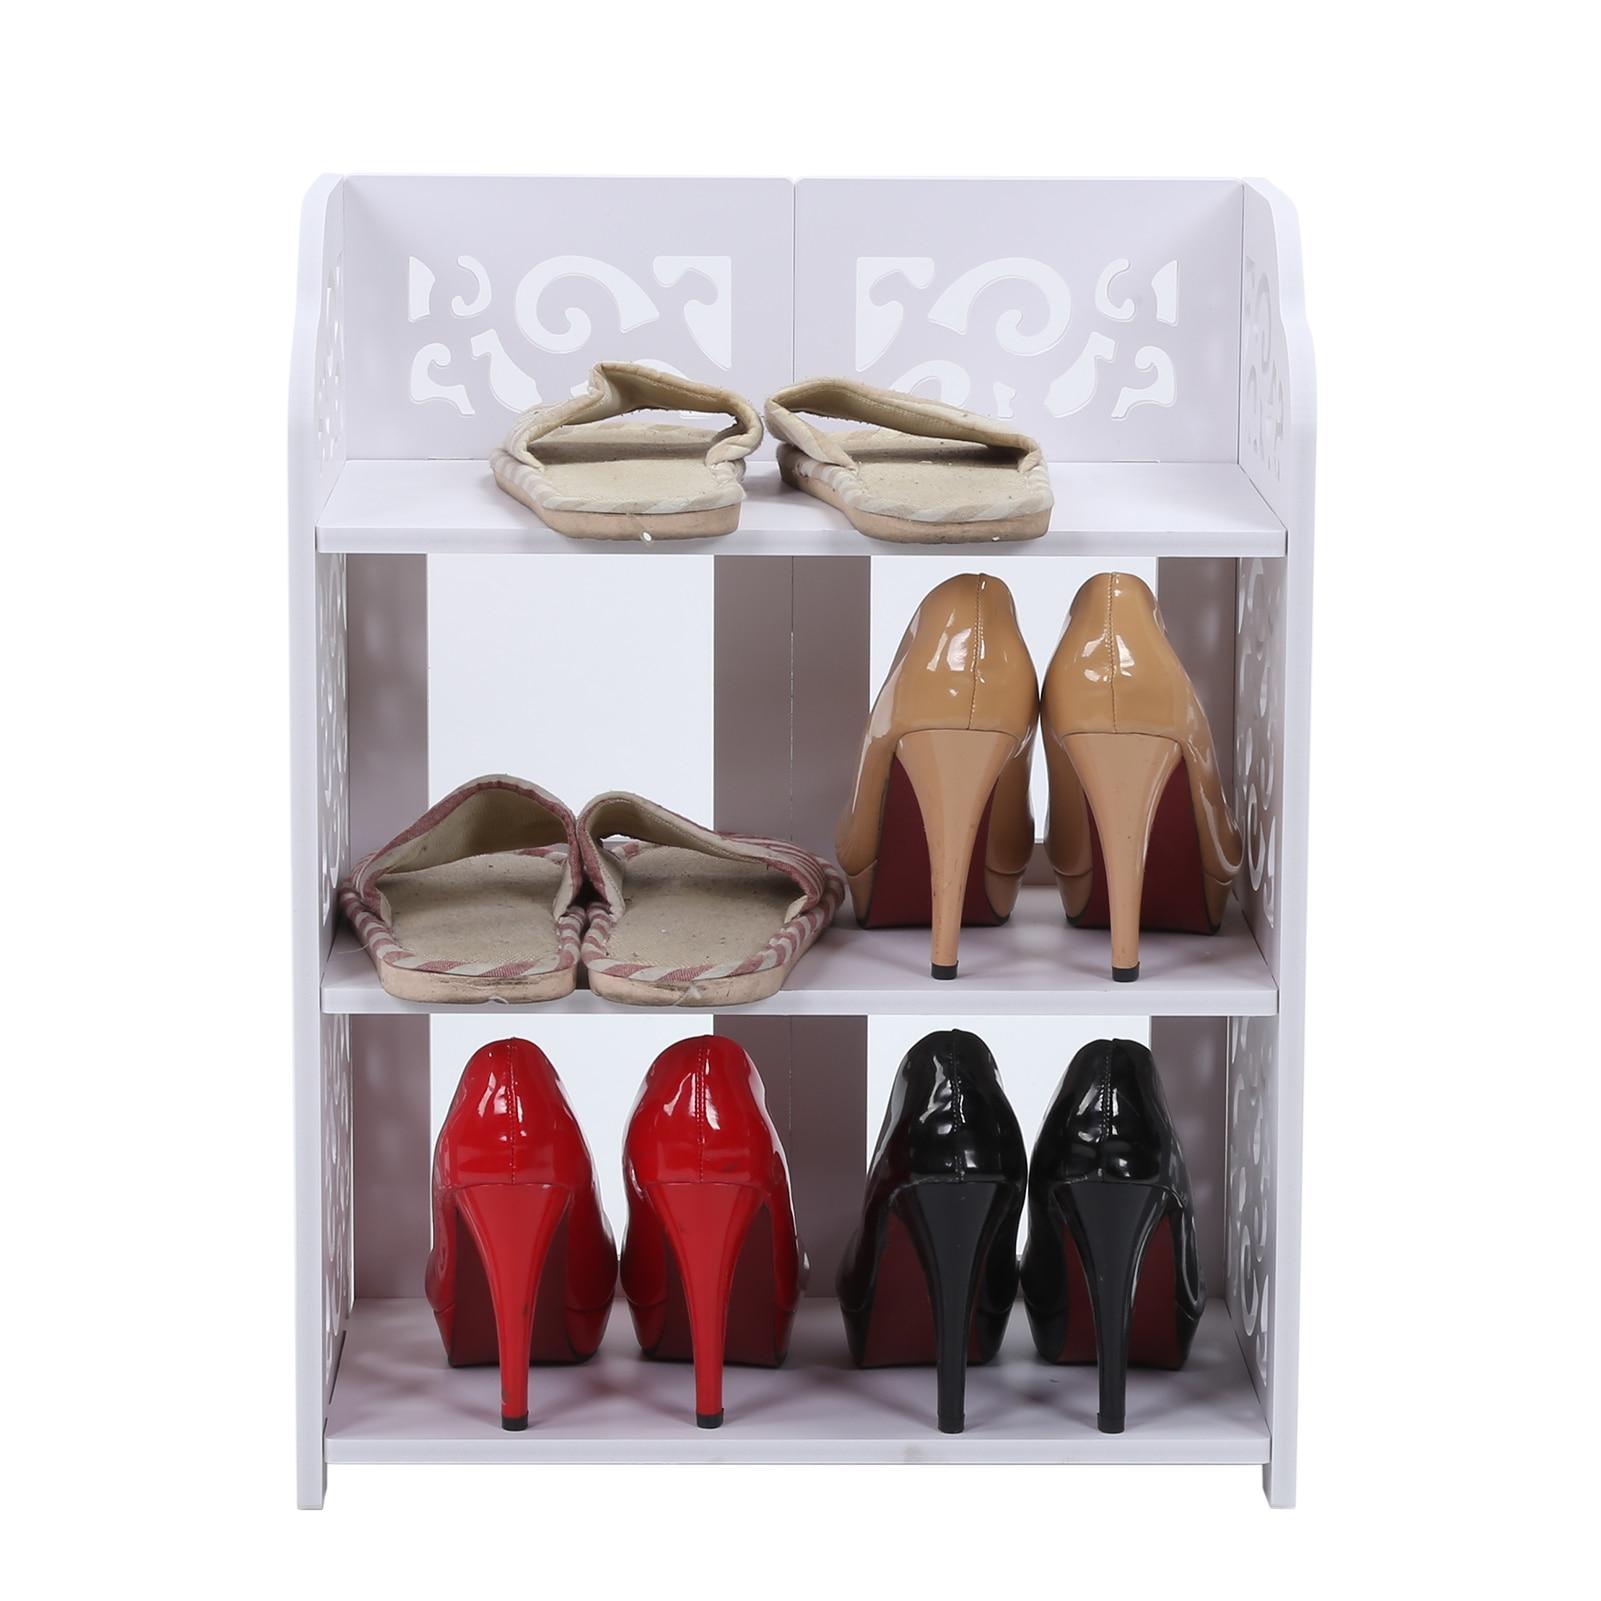 3 Tier Hollow Out Shoe Storage Rack Stand Shoe Storage Organiser Shelf for living room bedroom bathroom office